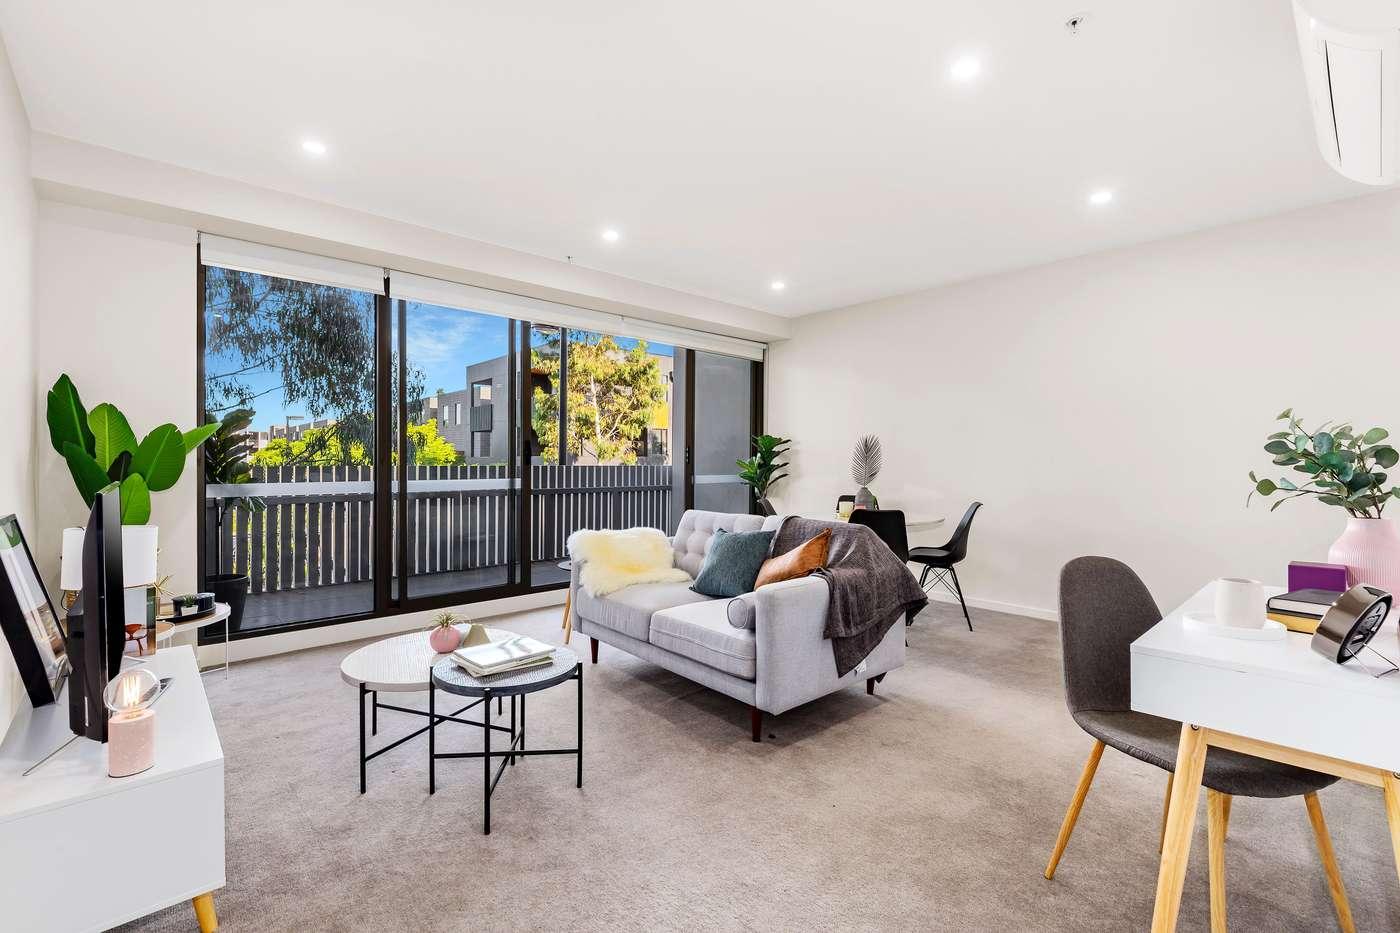 Main view of Homely apartment listing, 114/35 Princeton Terrace, Bundoora, VIC 3083